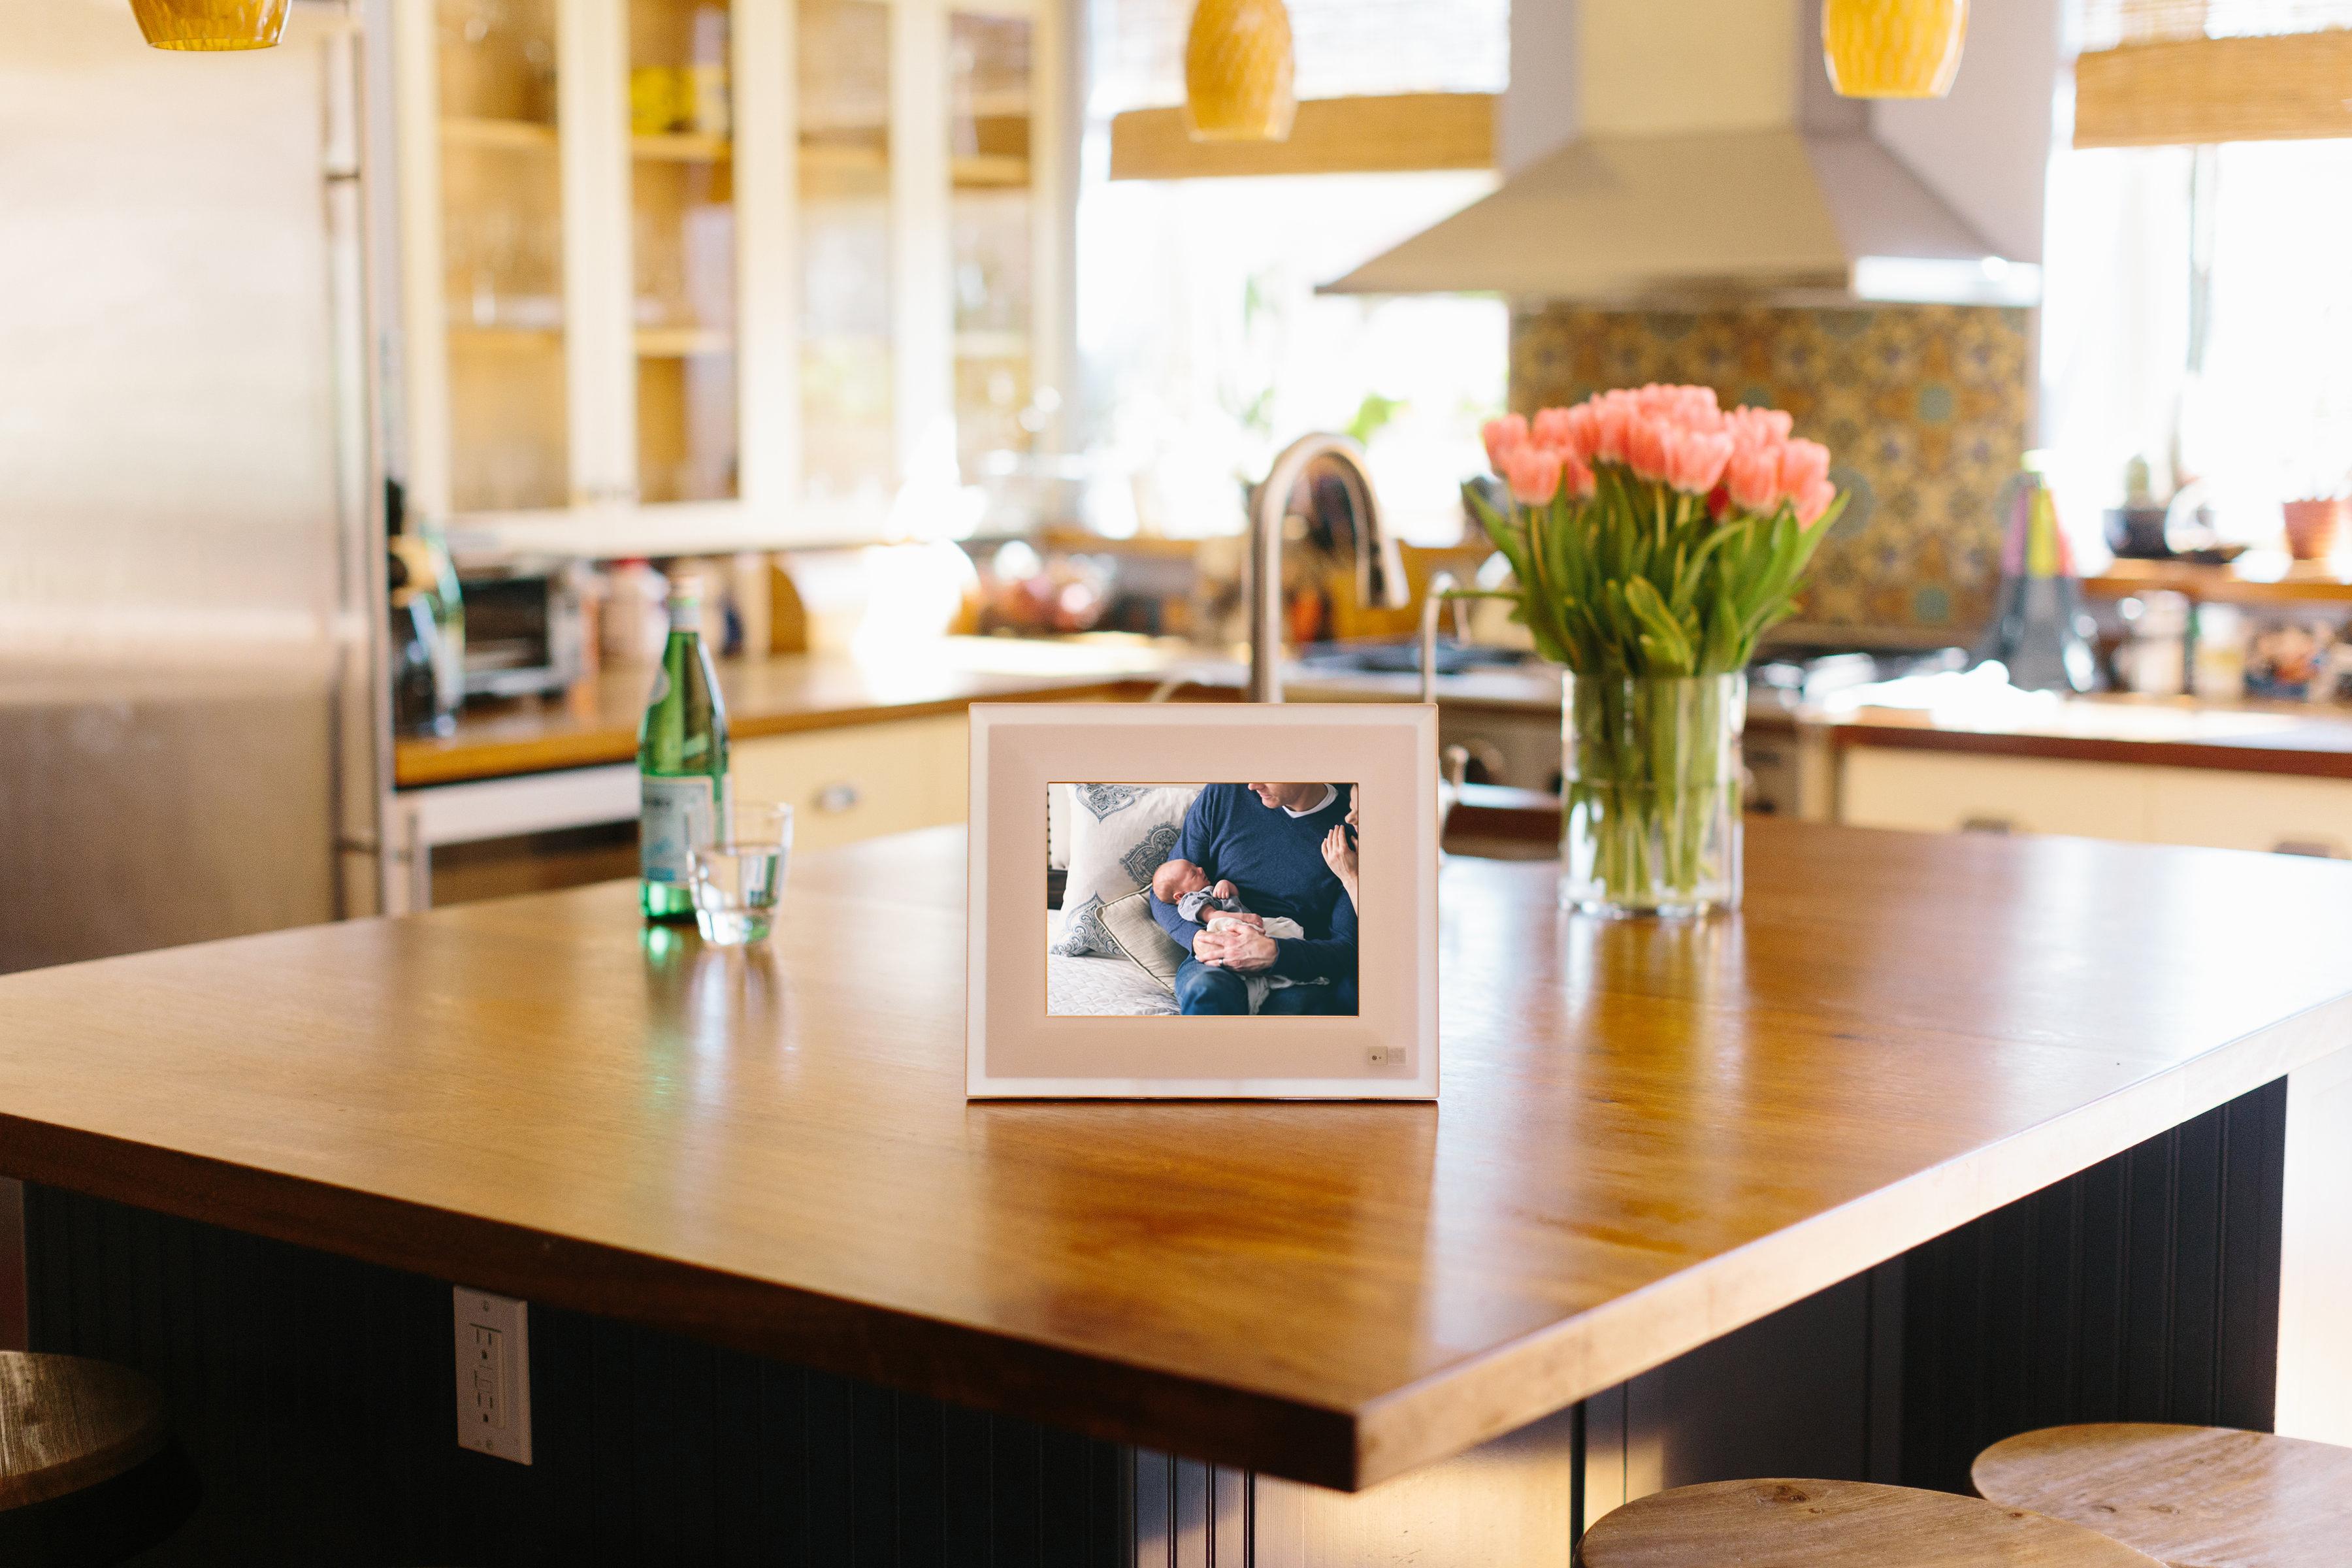 Kitchen Digital Frame.jpg